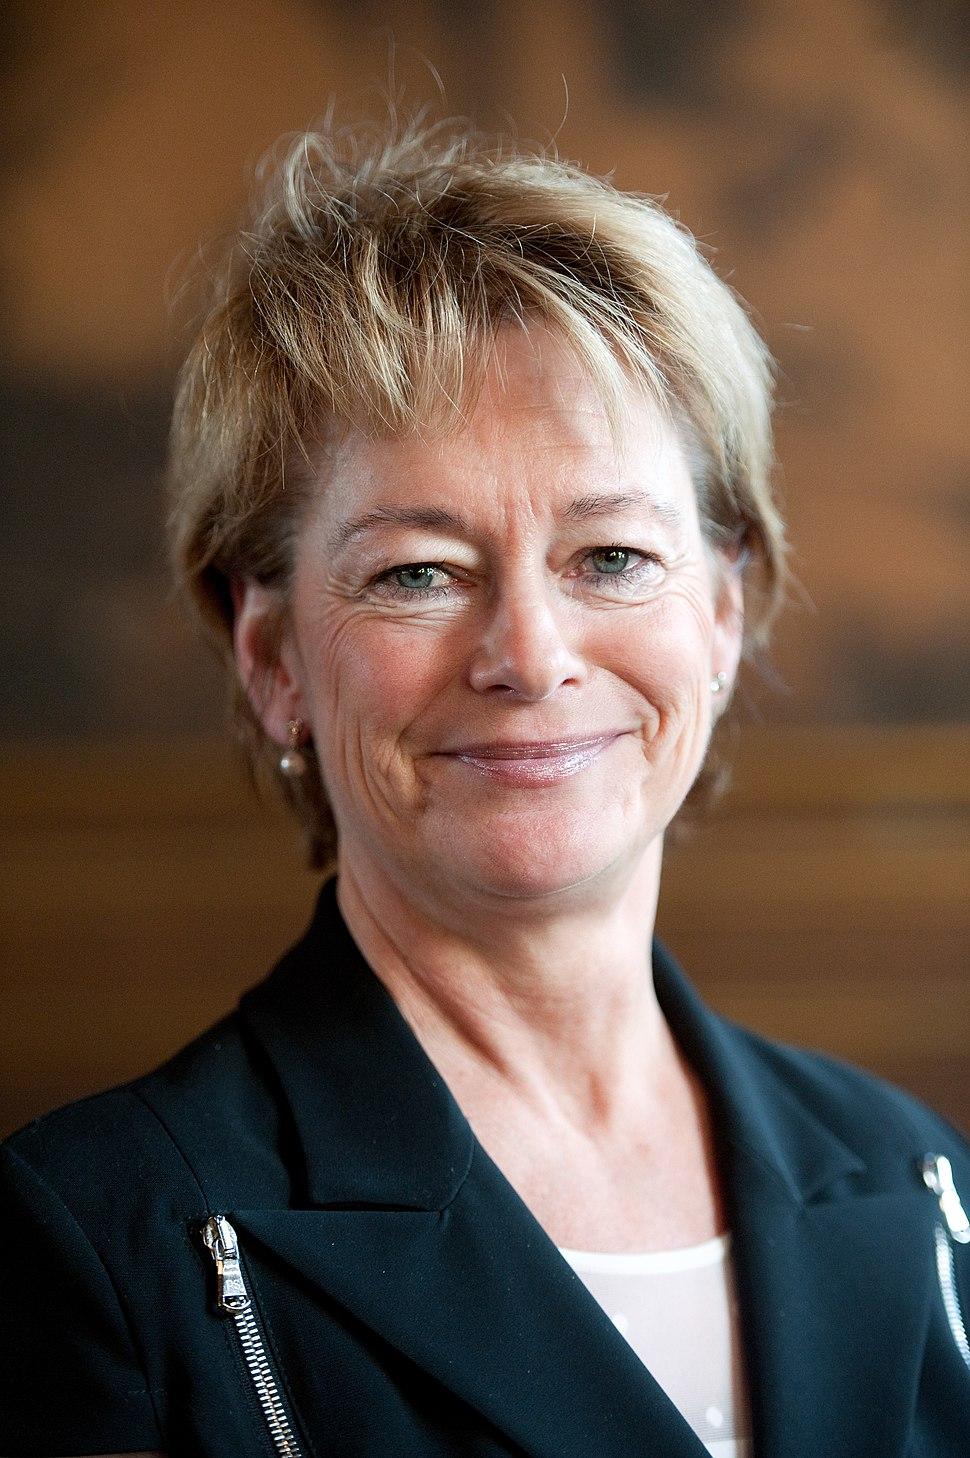 Lena Adelsohn Liljeroth kulturminister Sverige